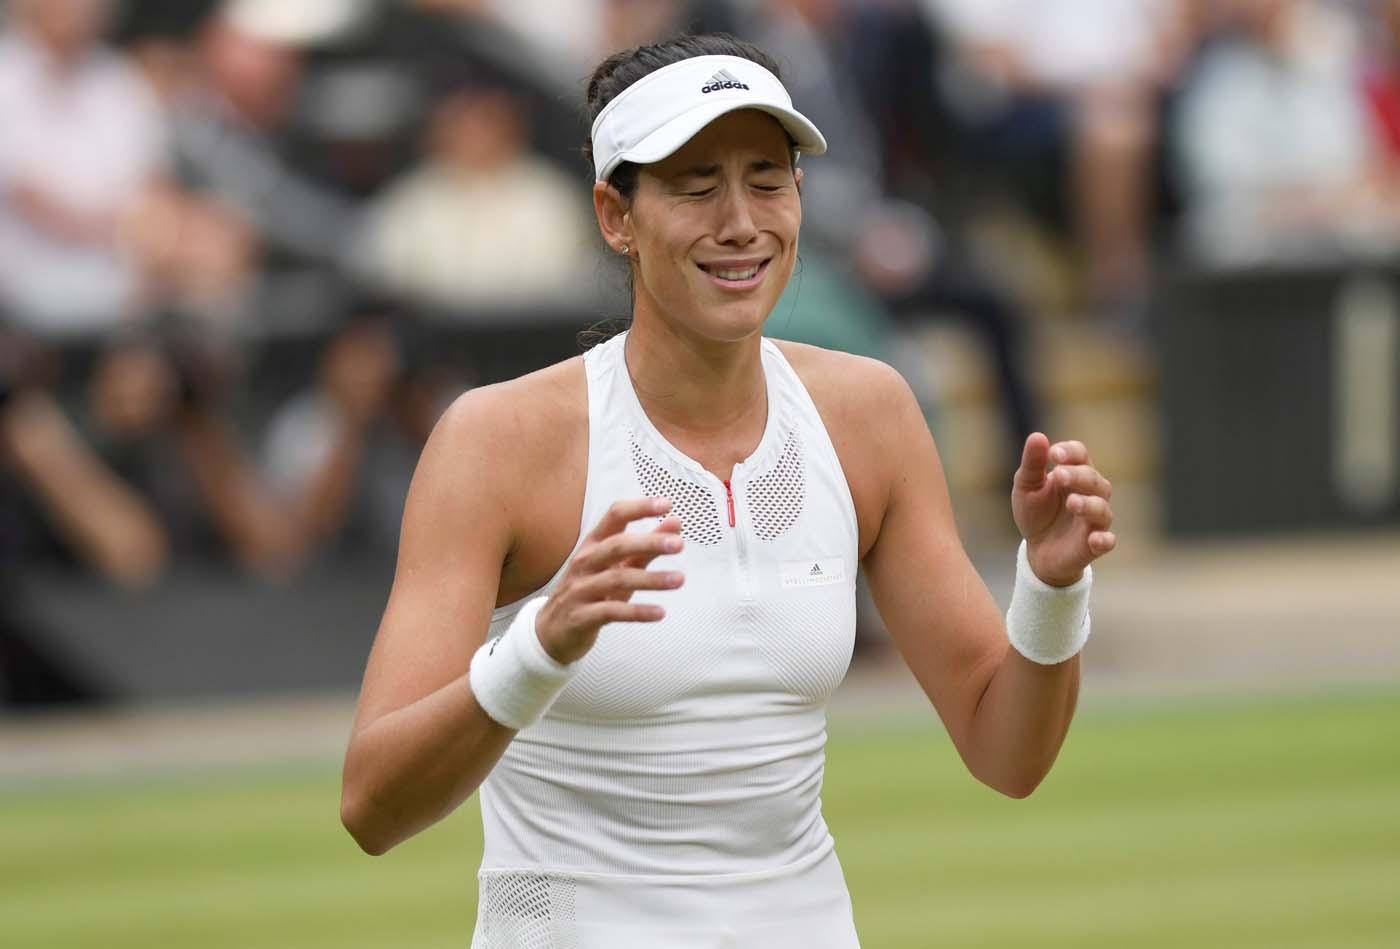 Tennis - Wimbledon - London, Britain - July 15, 2017 Spain's Garbine Muguruza celebrates winning the final against Venus Williams of the U.S. REUTERS/Tony O'Brien